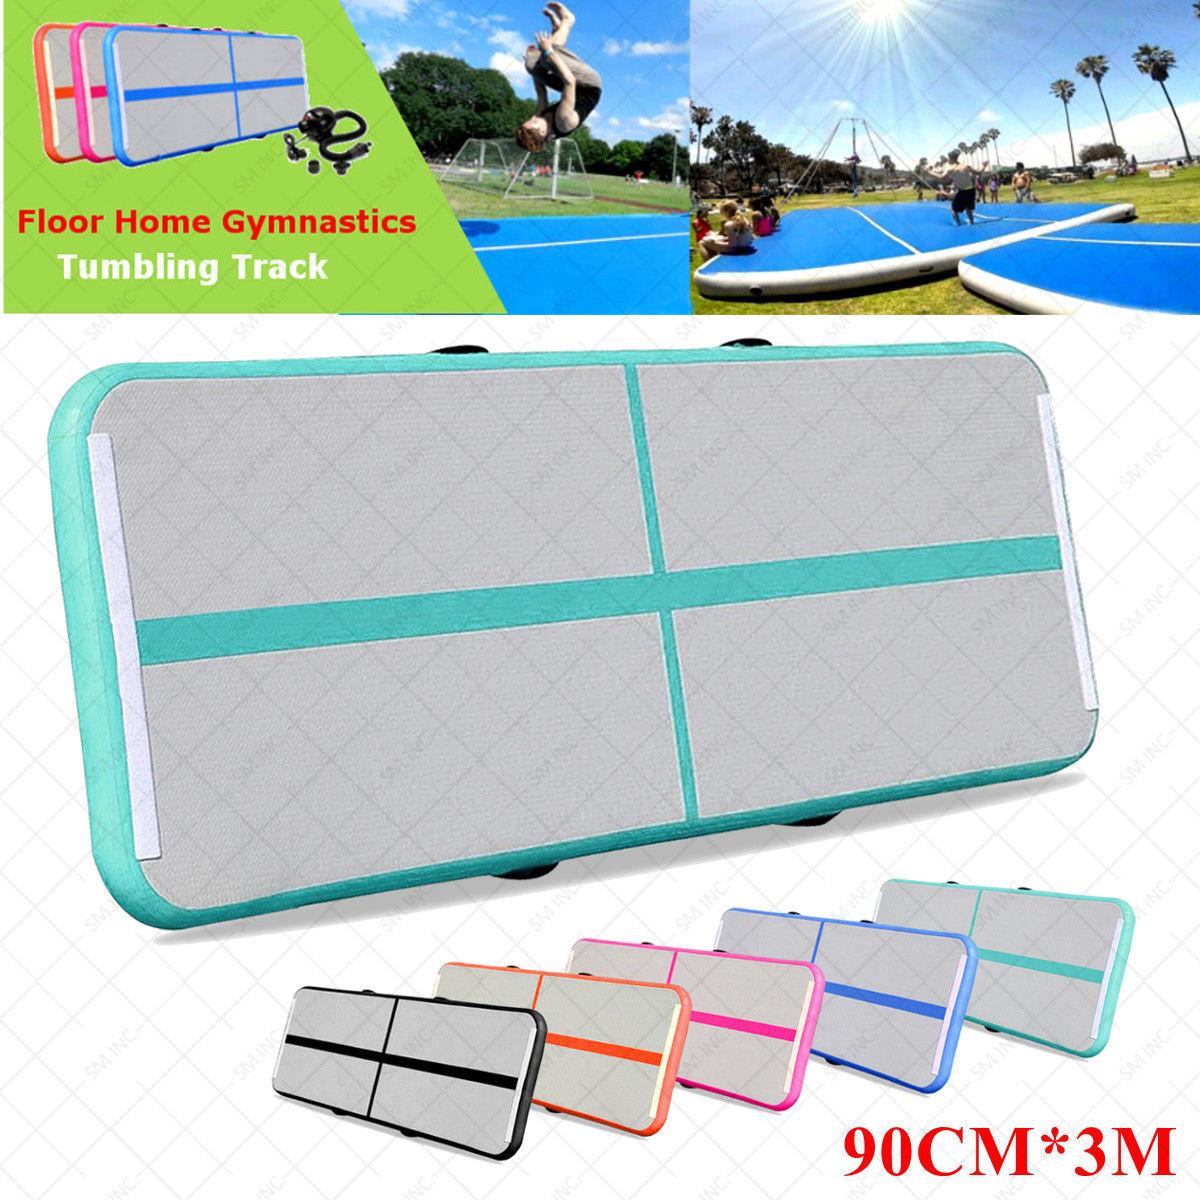 Home Gymnastics Tumbling Air Track Floor Mat Inflatable